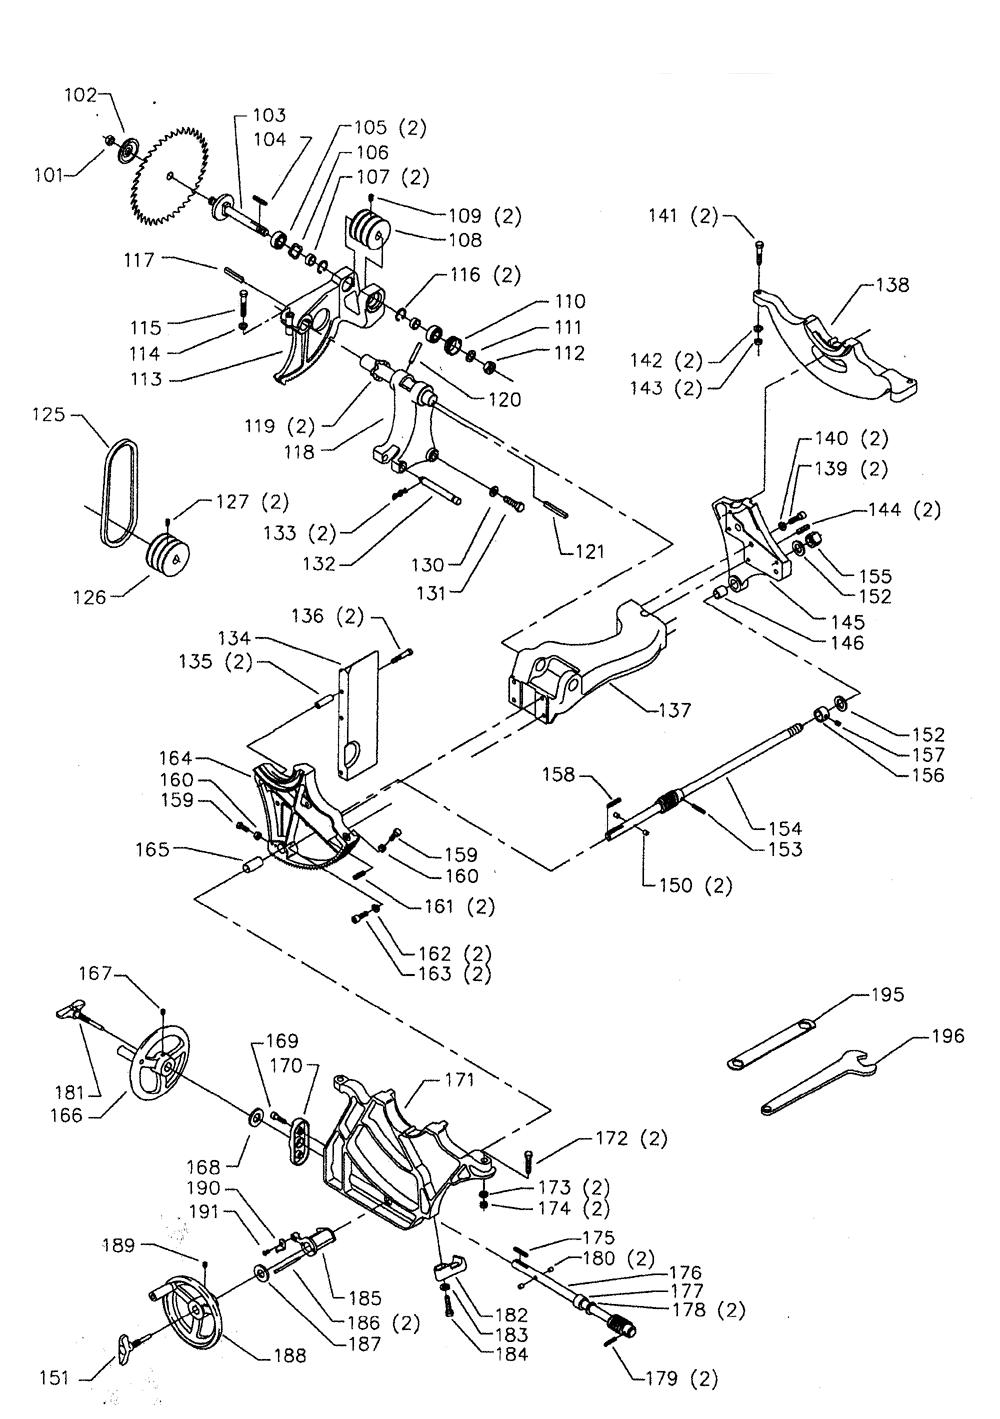 36-816-delta-PB-1Break Down